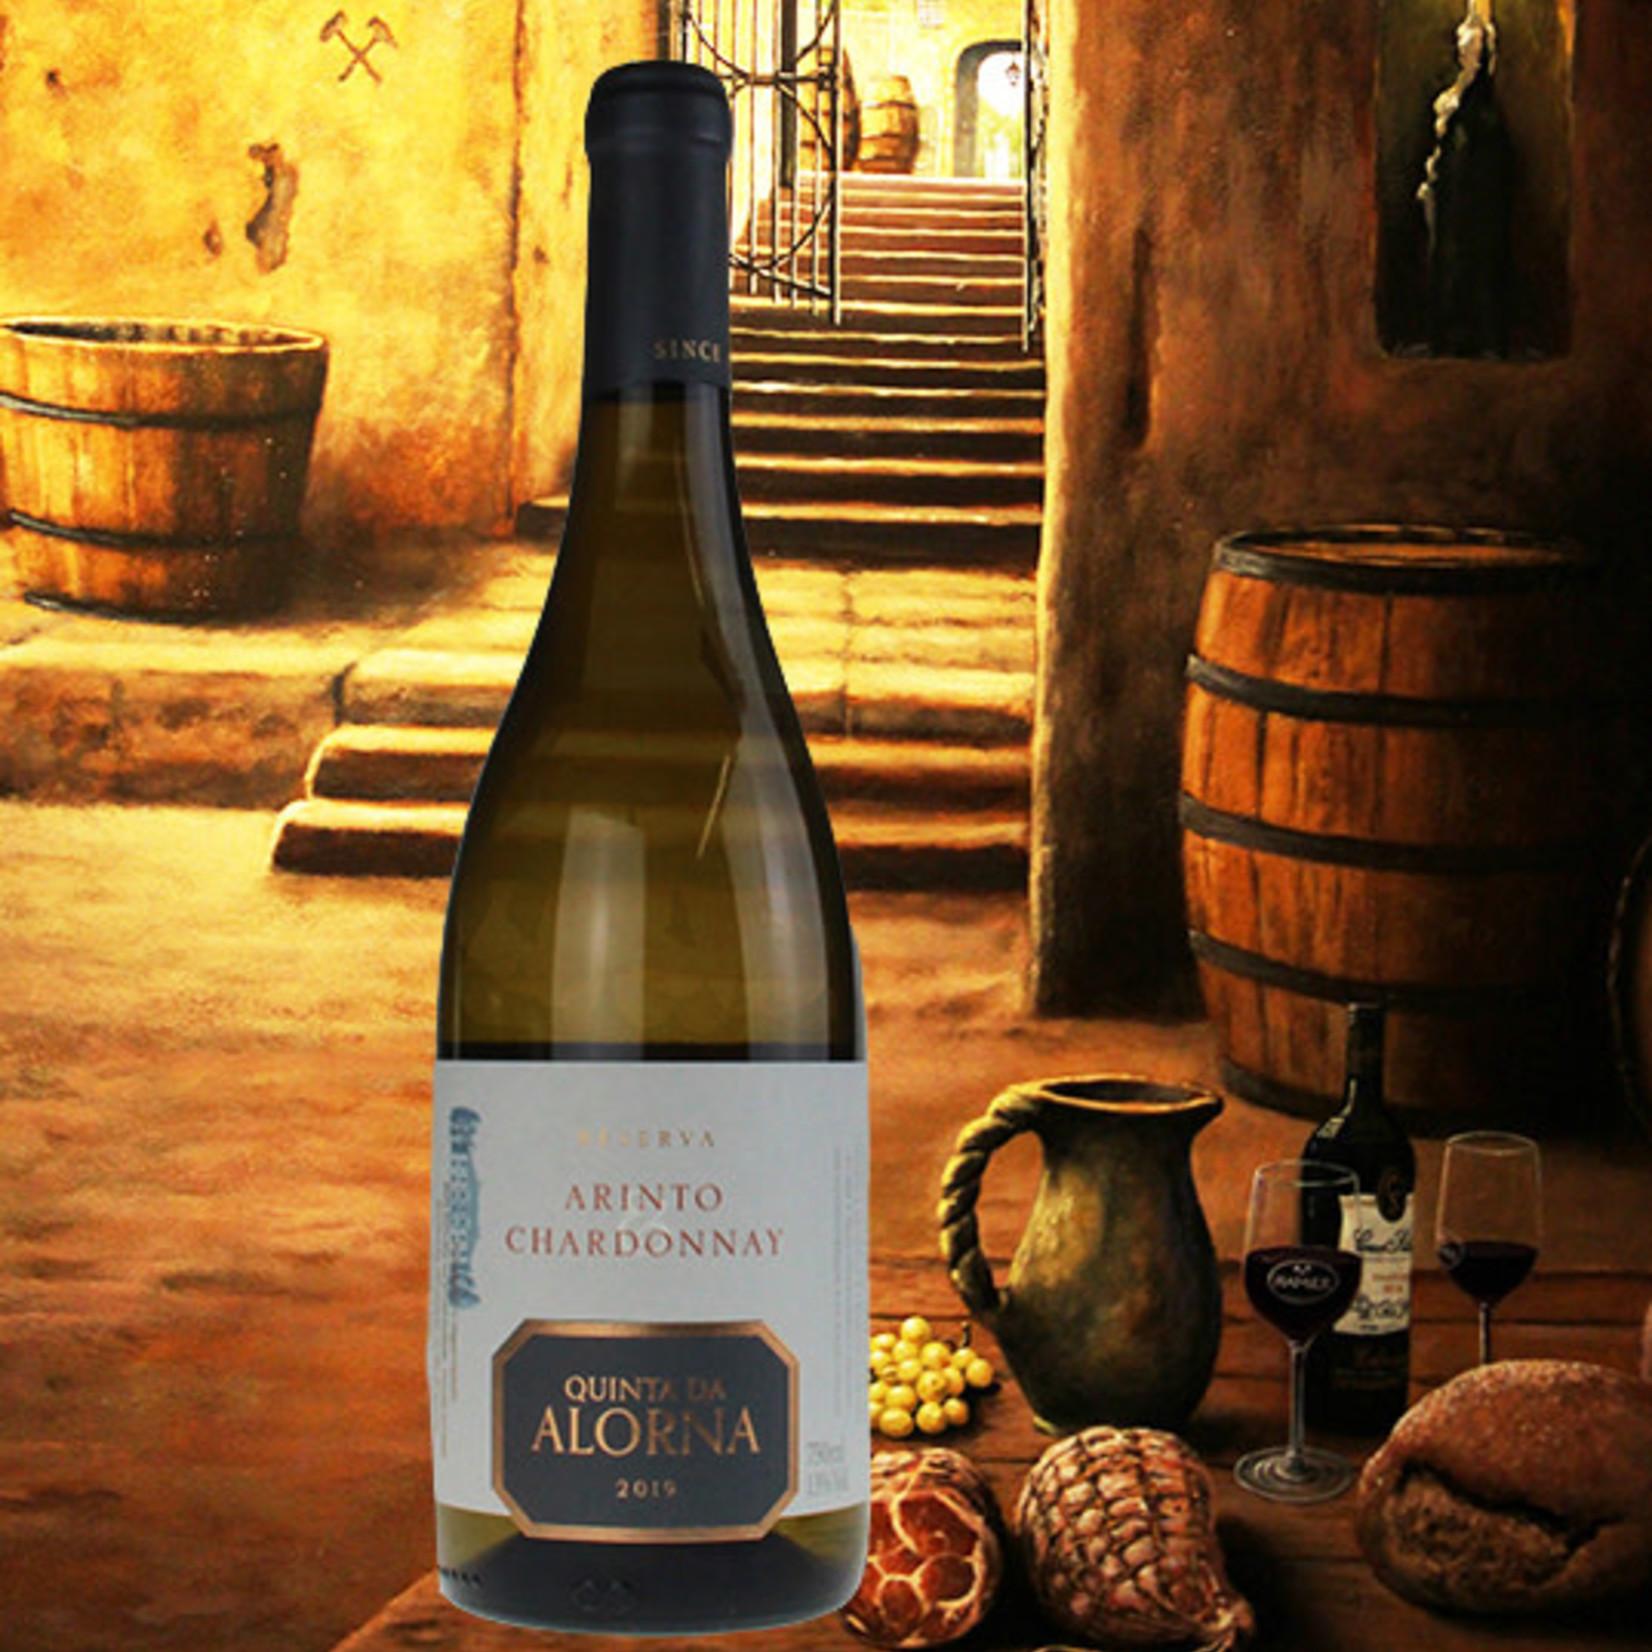 Quinta da Alorna Quinta da Alorna Reserve Arinto-Chardonnay Wit